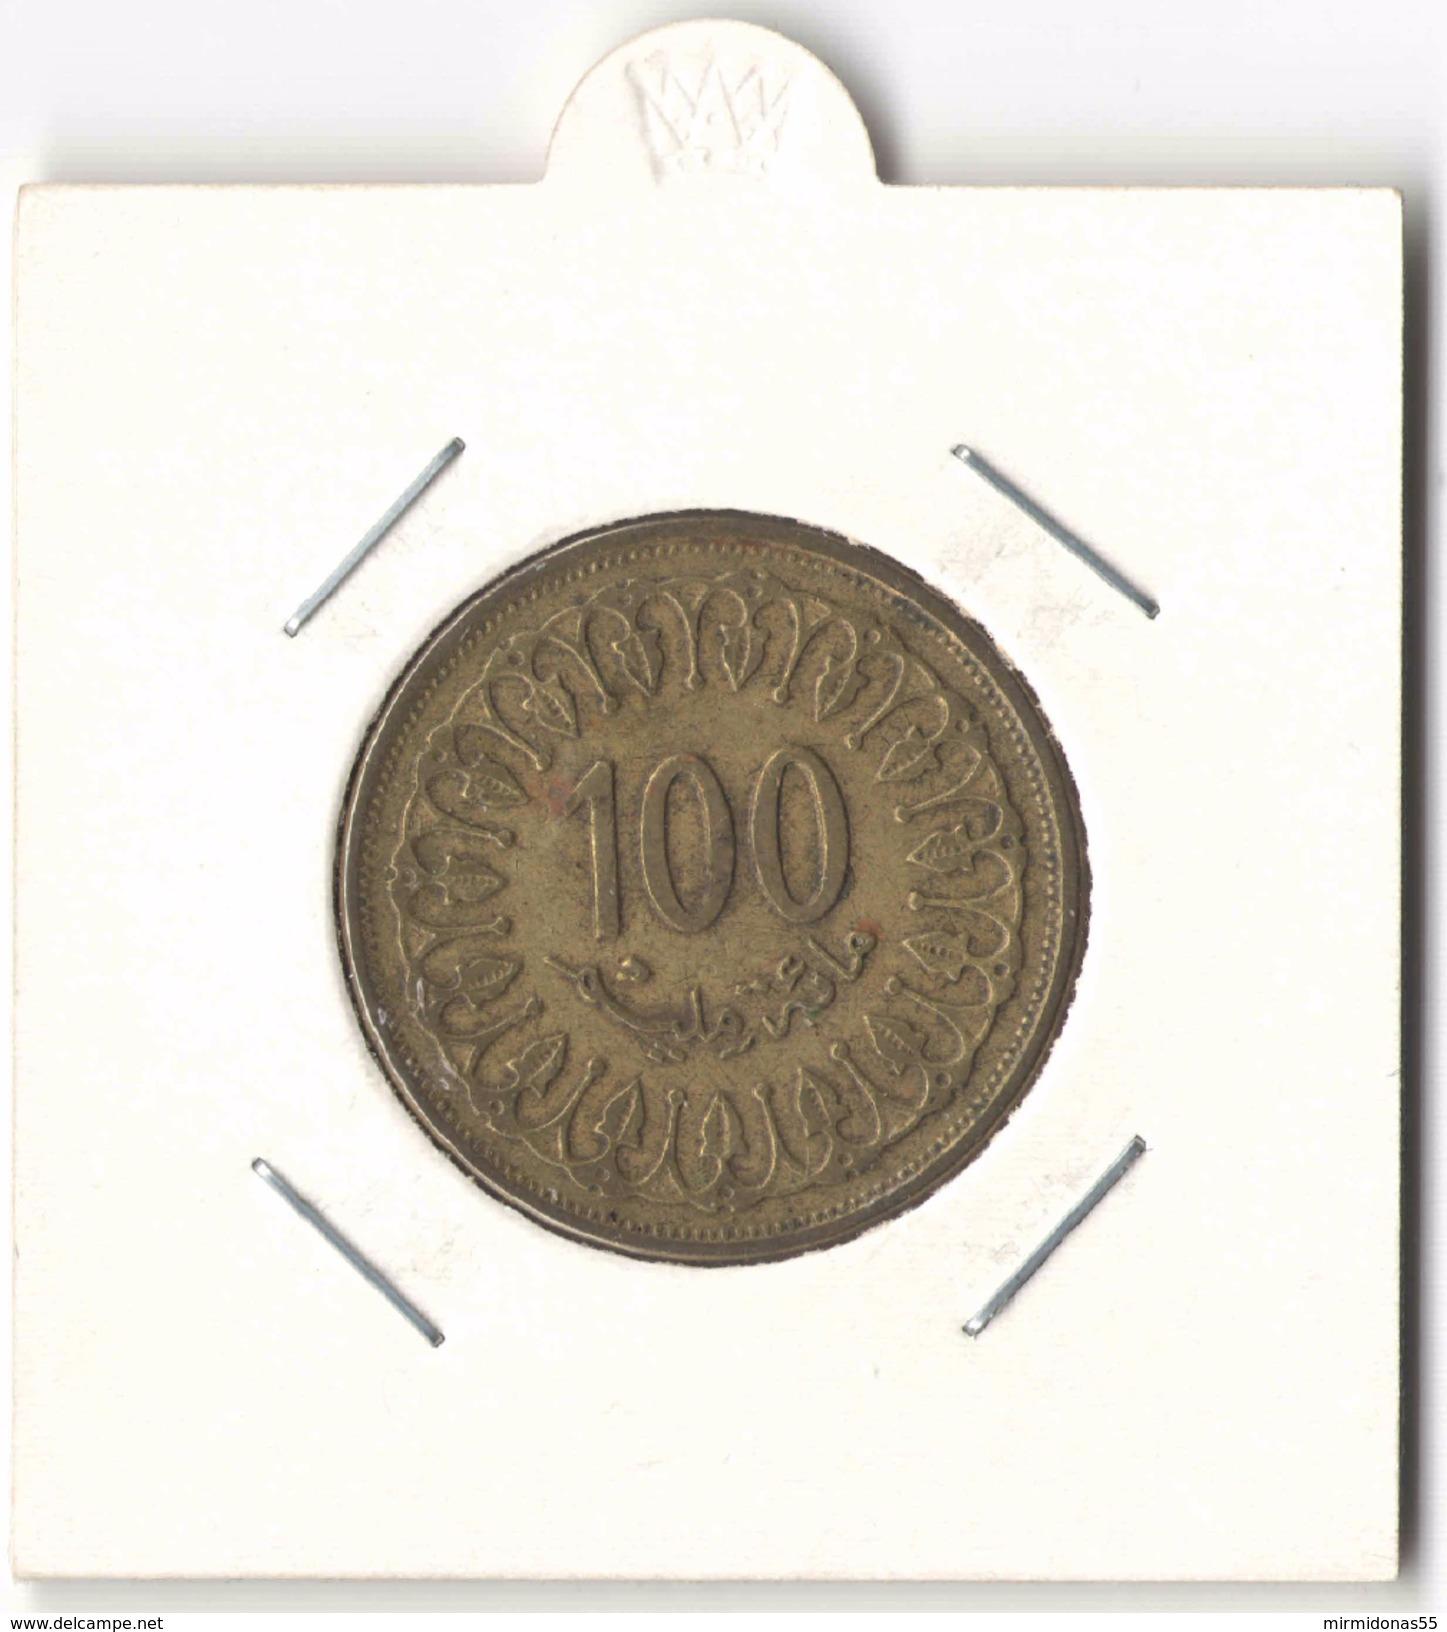 100 Millim1993 (1414) - Tunisia Coin (Tunisie, Millimes) - Tunisia